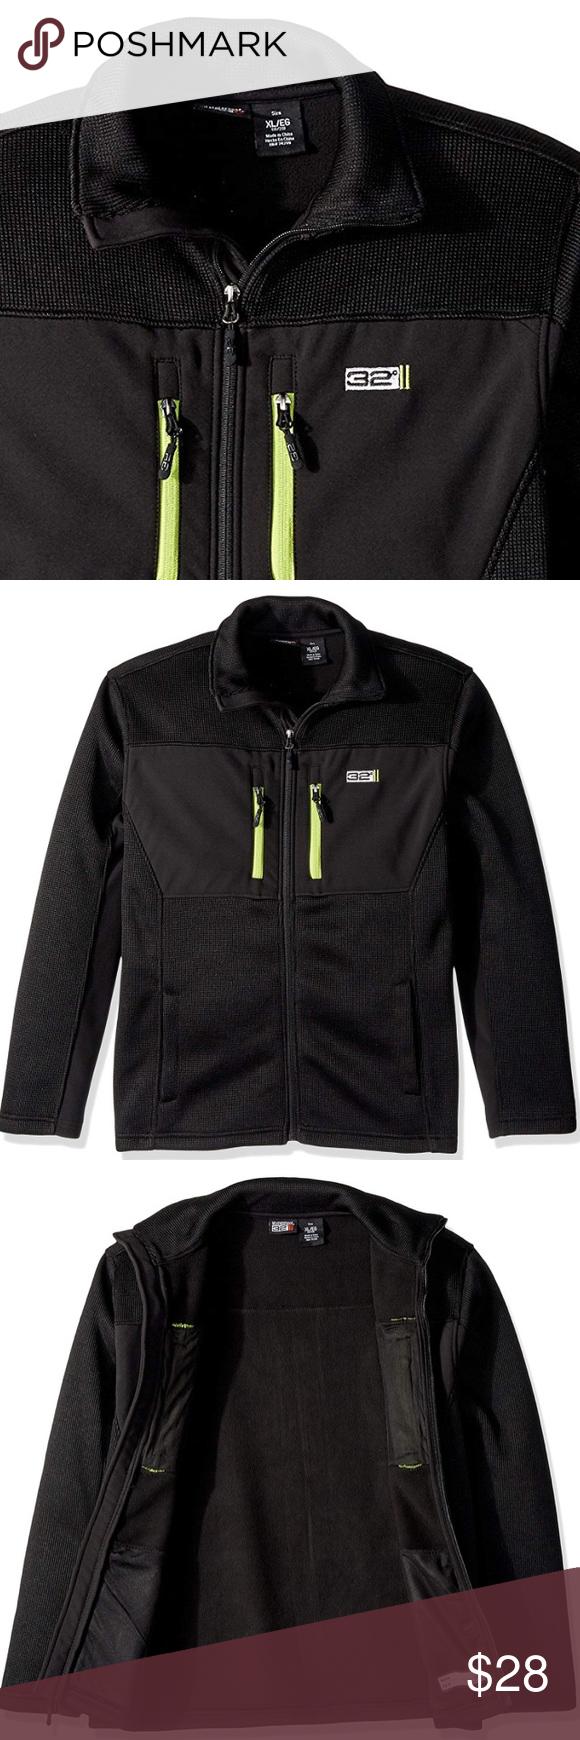 Big Boys Outerwear Jacket Softshell New With Tags Black Black 32 Degrees Weatherproof Big Boys Outerwear Boy Outerwear Outerwear Jackets Weatherproof Jacket [ 1740 x 580 Pixel ]